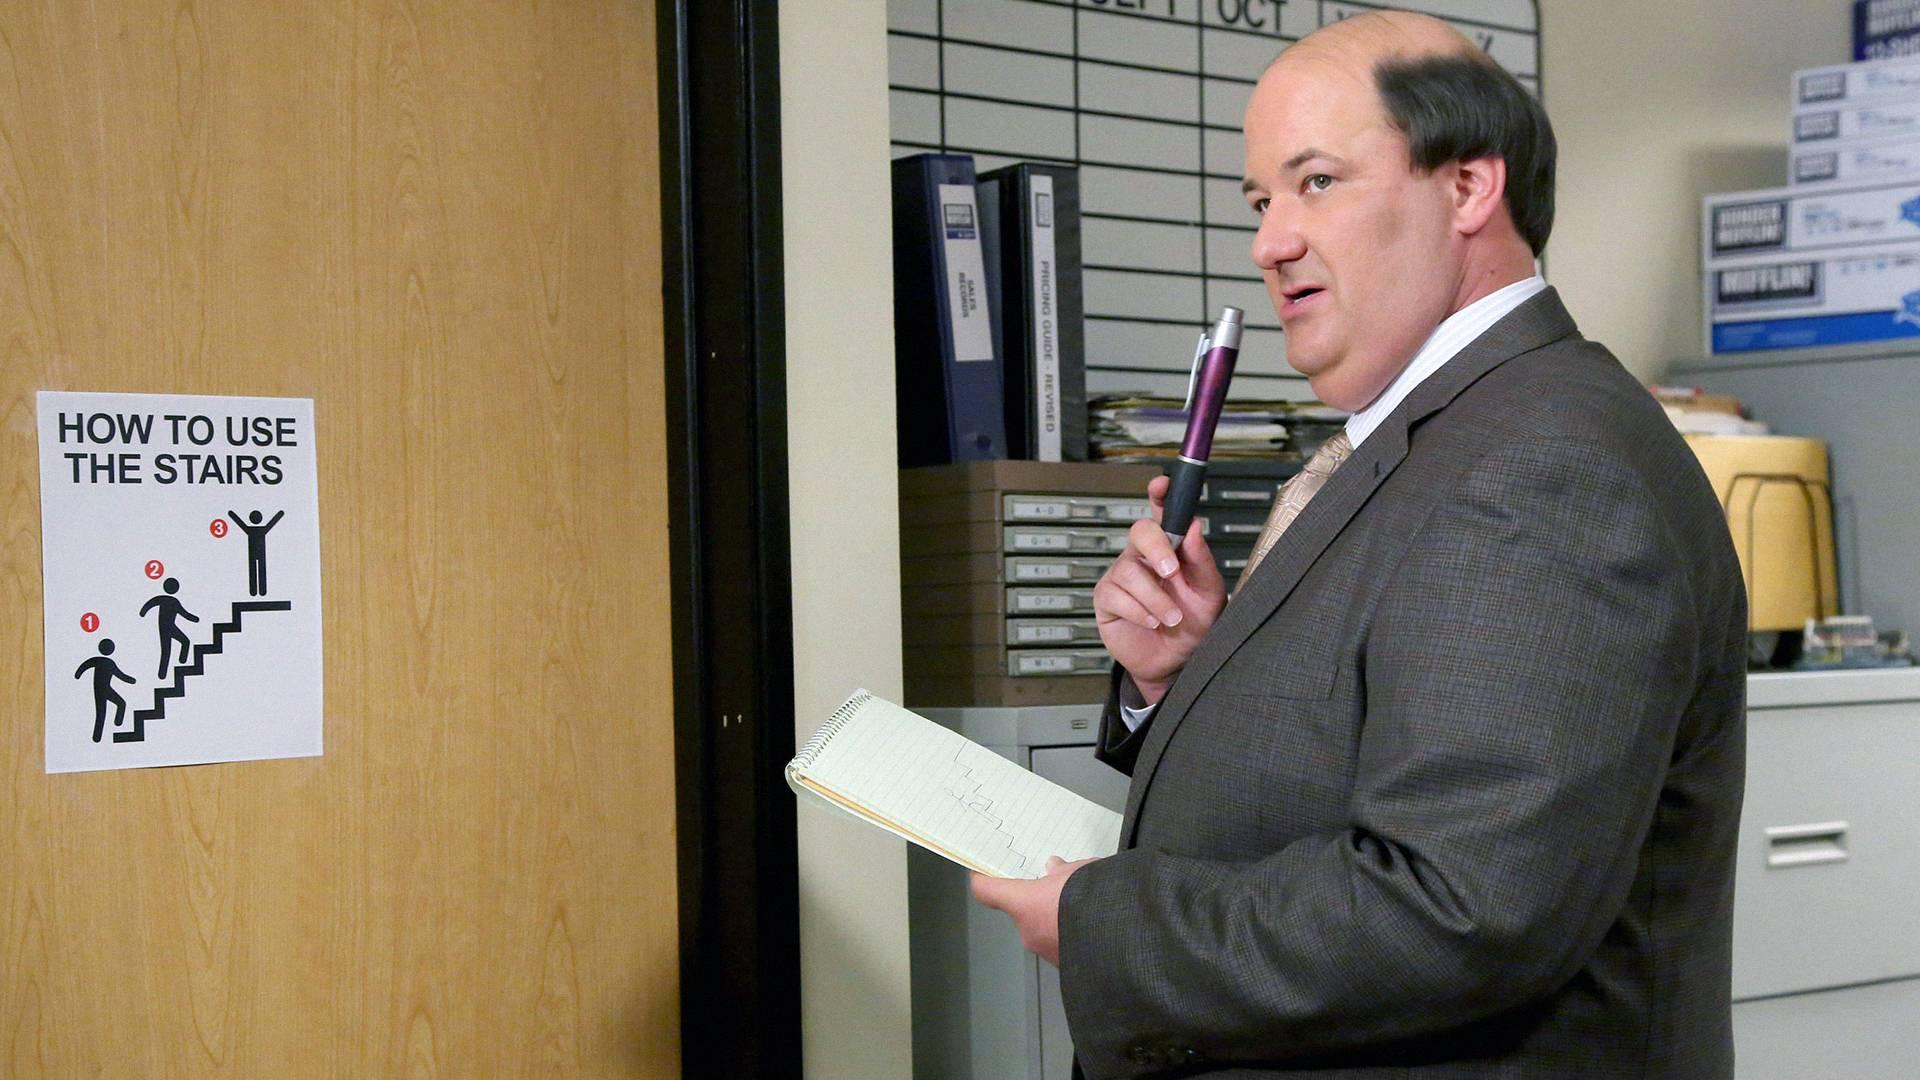 The Office Season 9 Episode 20